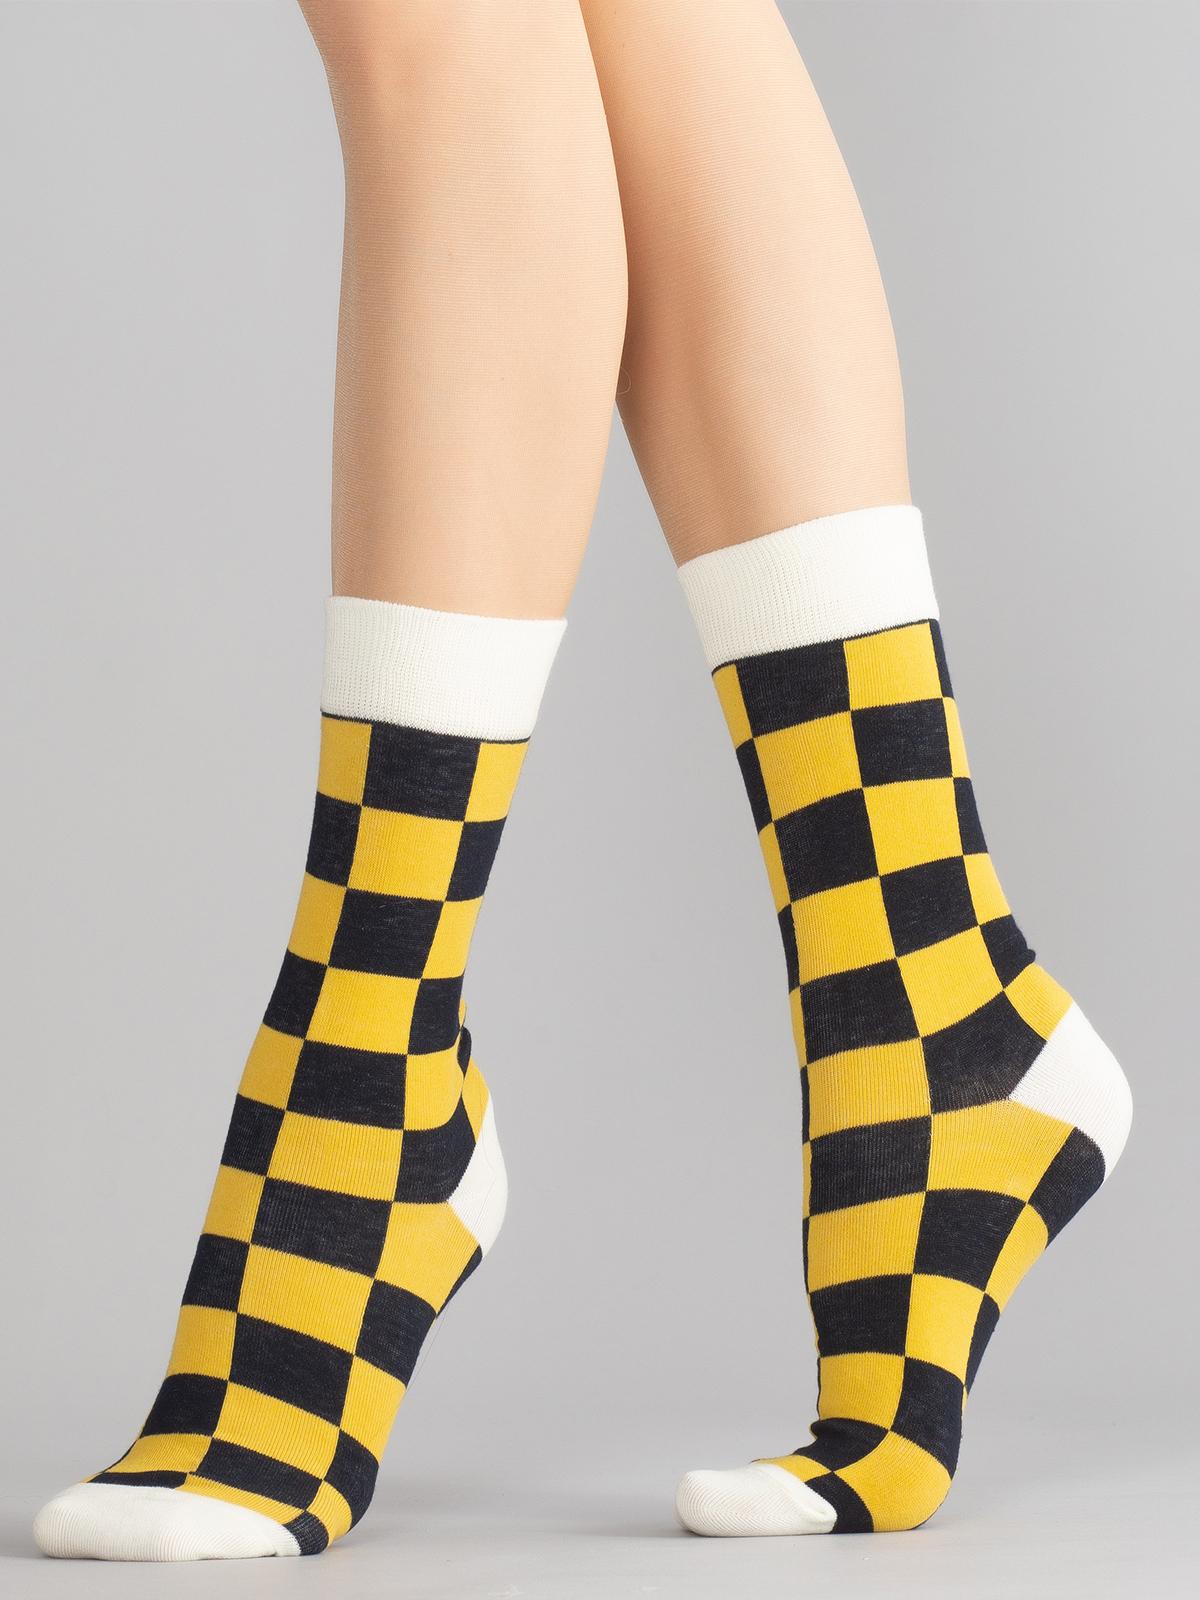 Носки женские Hobby Line HOBBY 80126-13-06 желтые 36-40